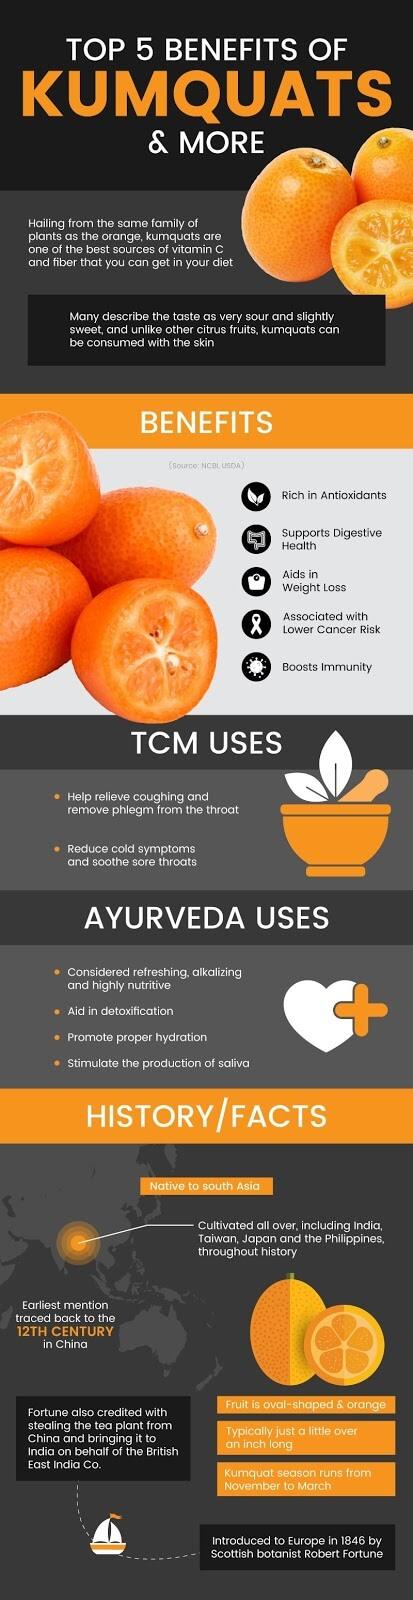 How To Eat A Kumquat, Kumquat Recipes, Kumquat Tree, Kumquats, kumquat